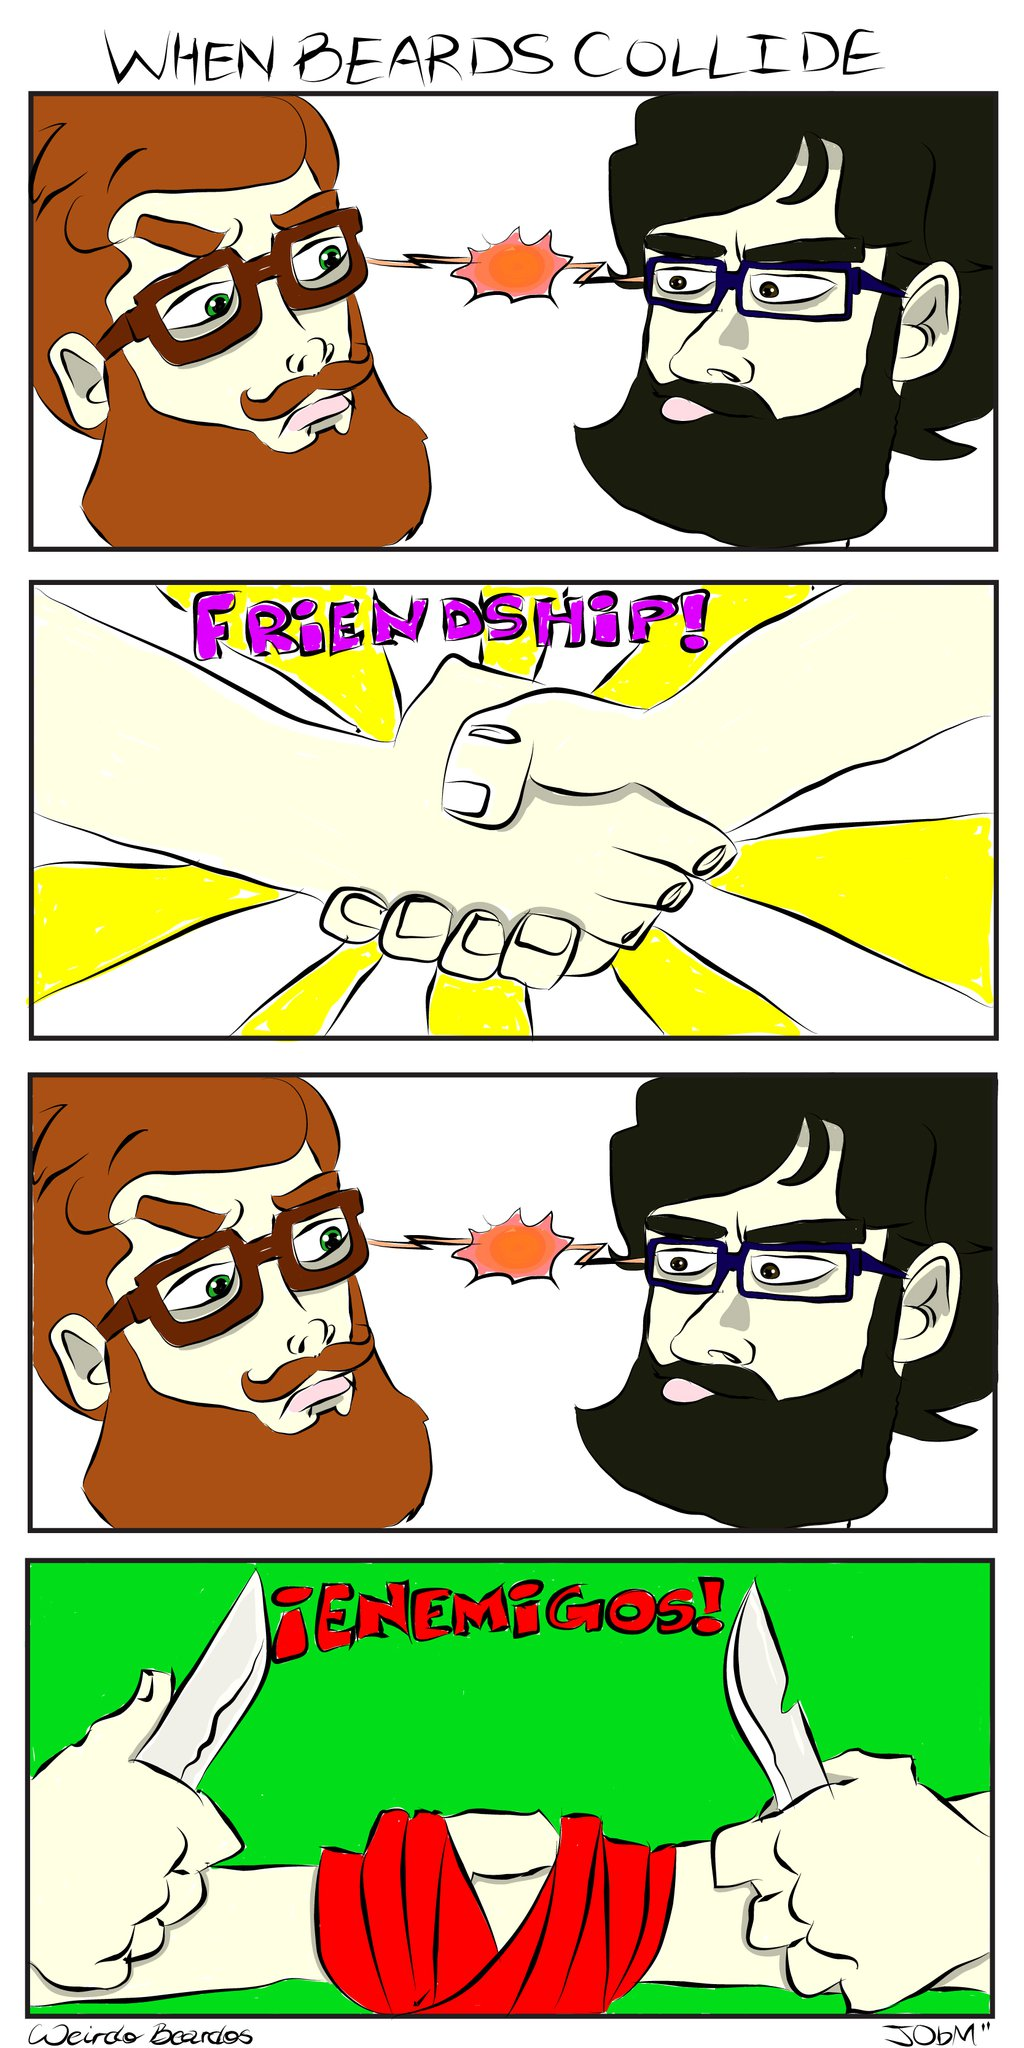 When Beards Collide